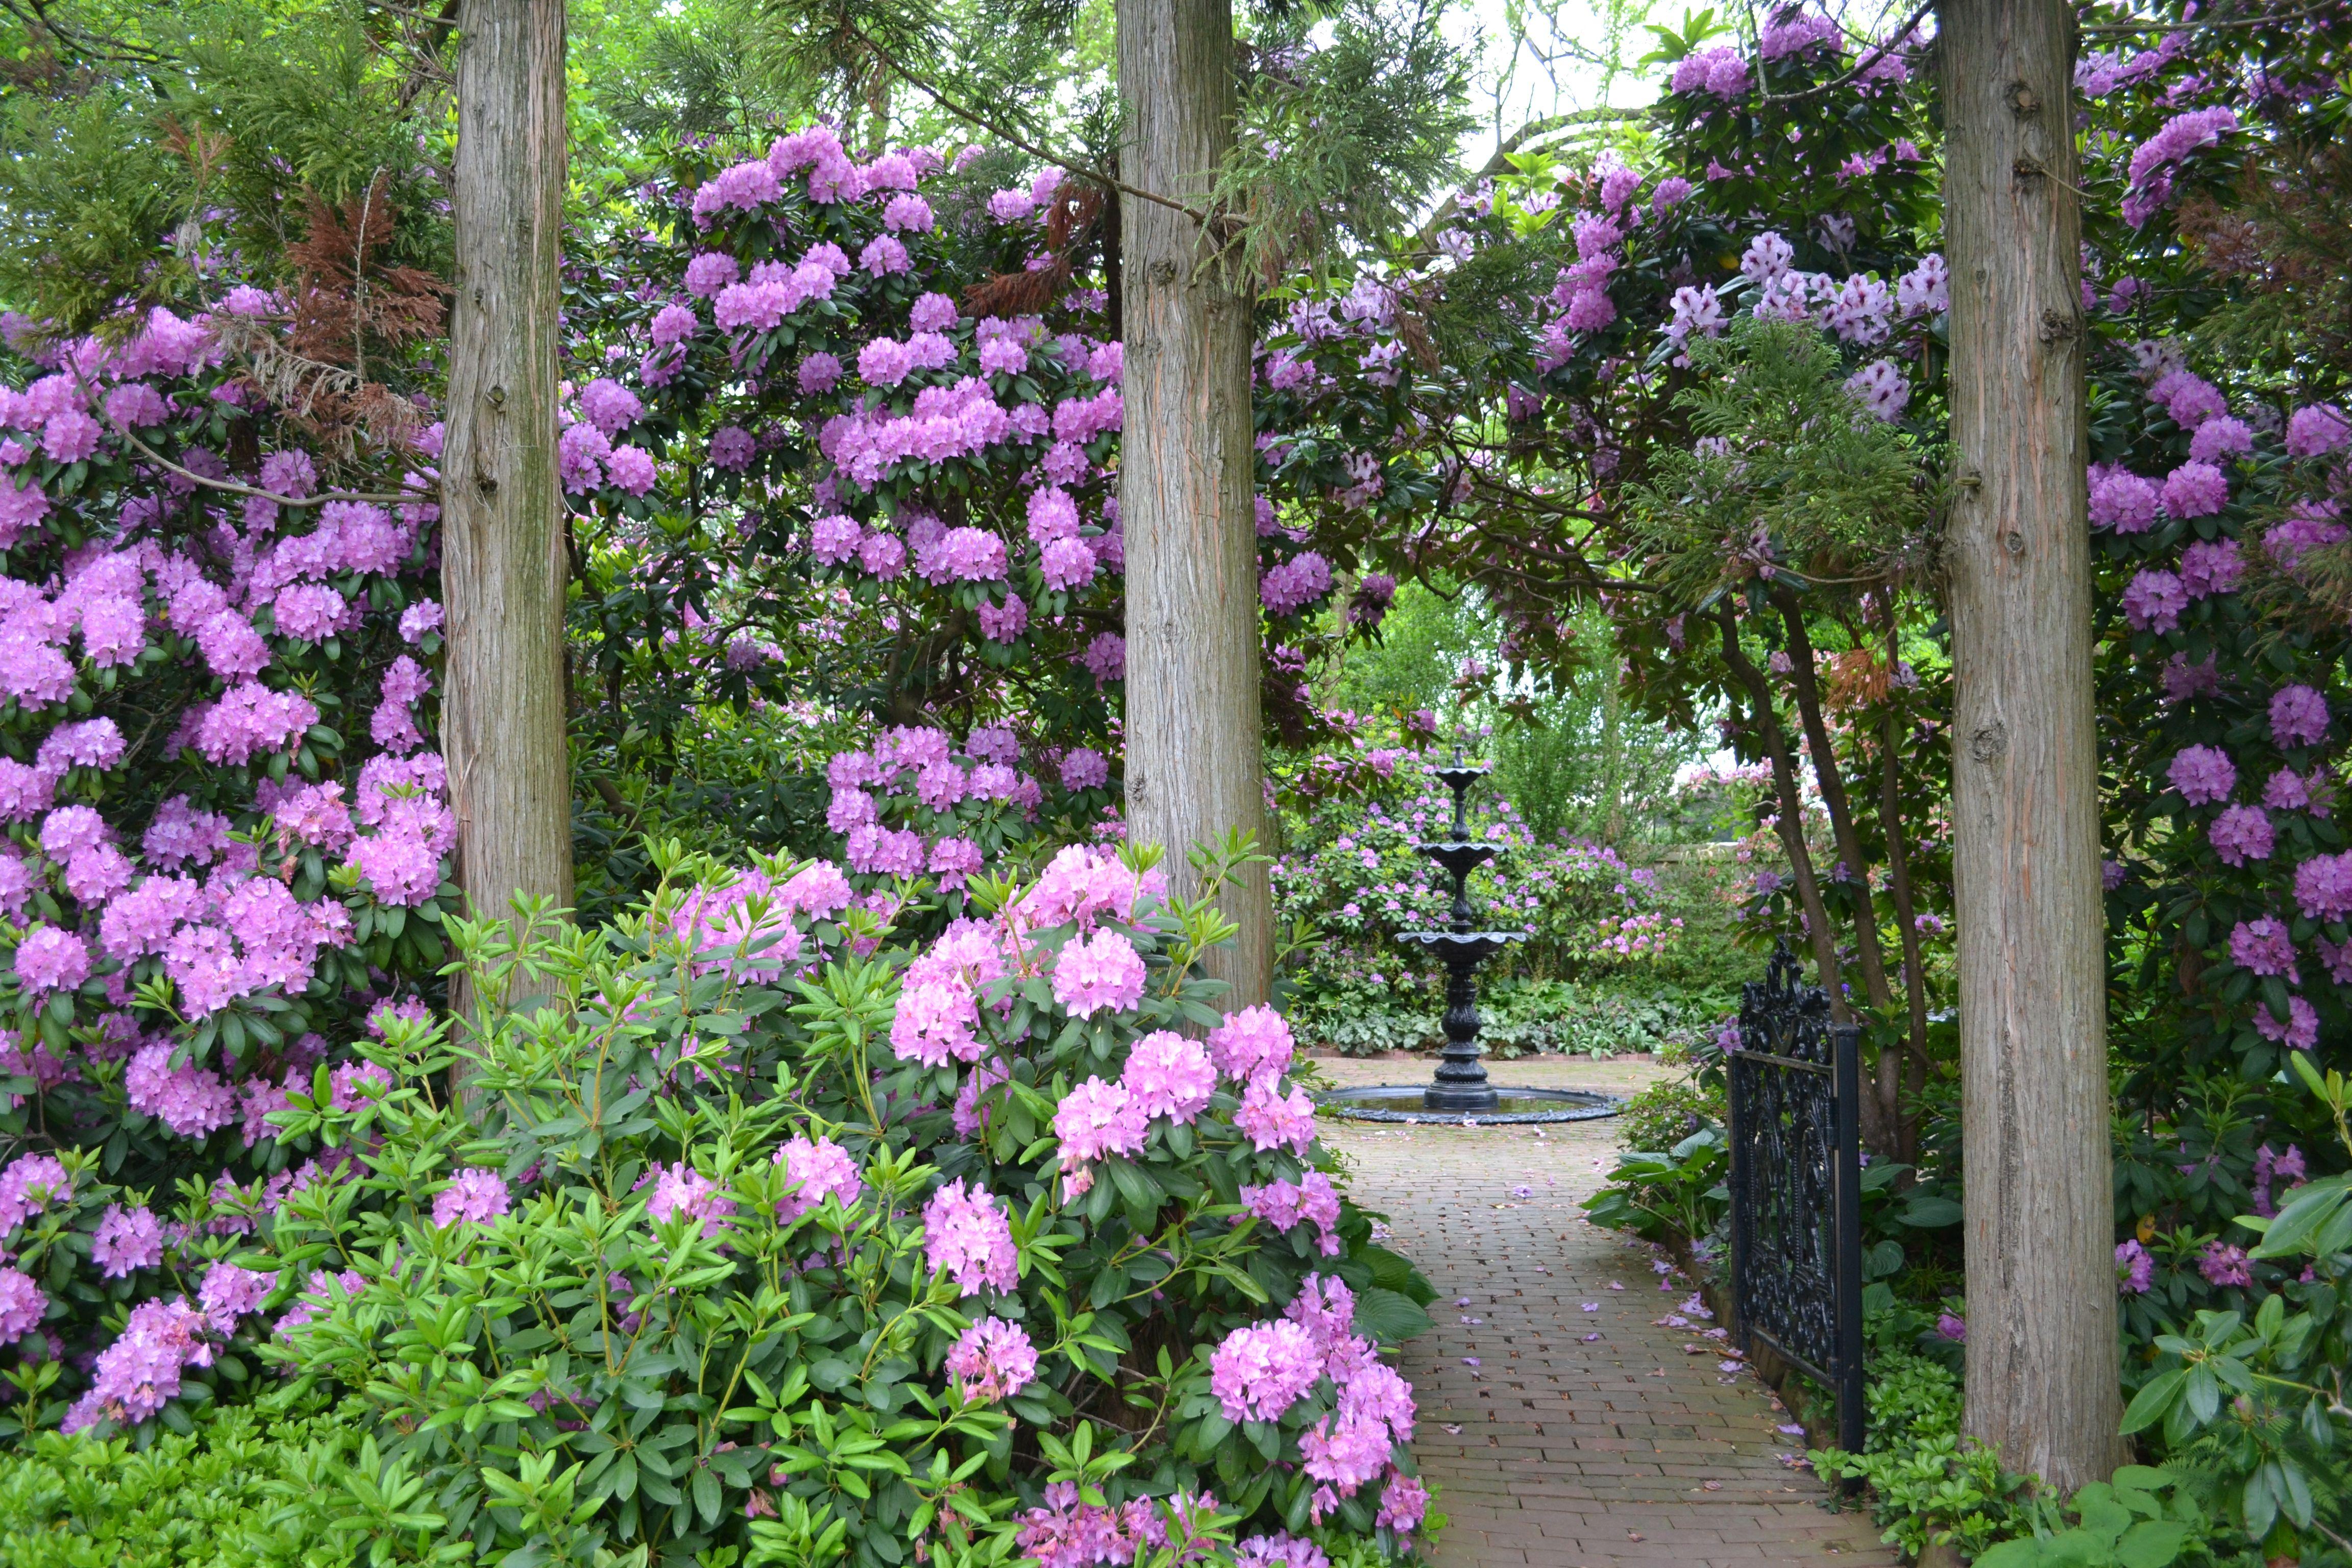 The Victorian Garden Victorian gardens, Garden room, Garden